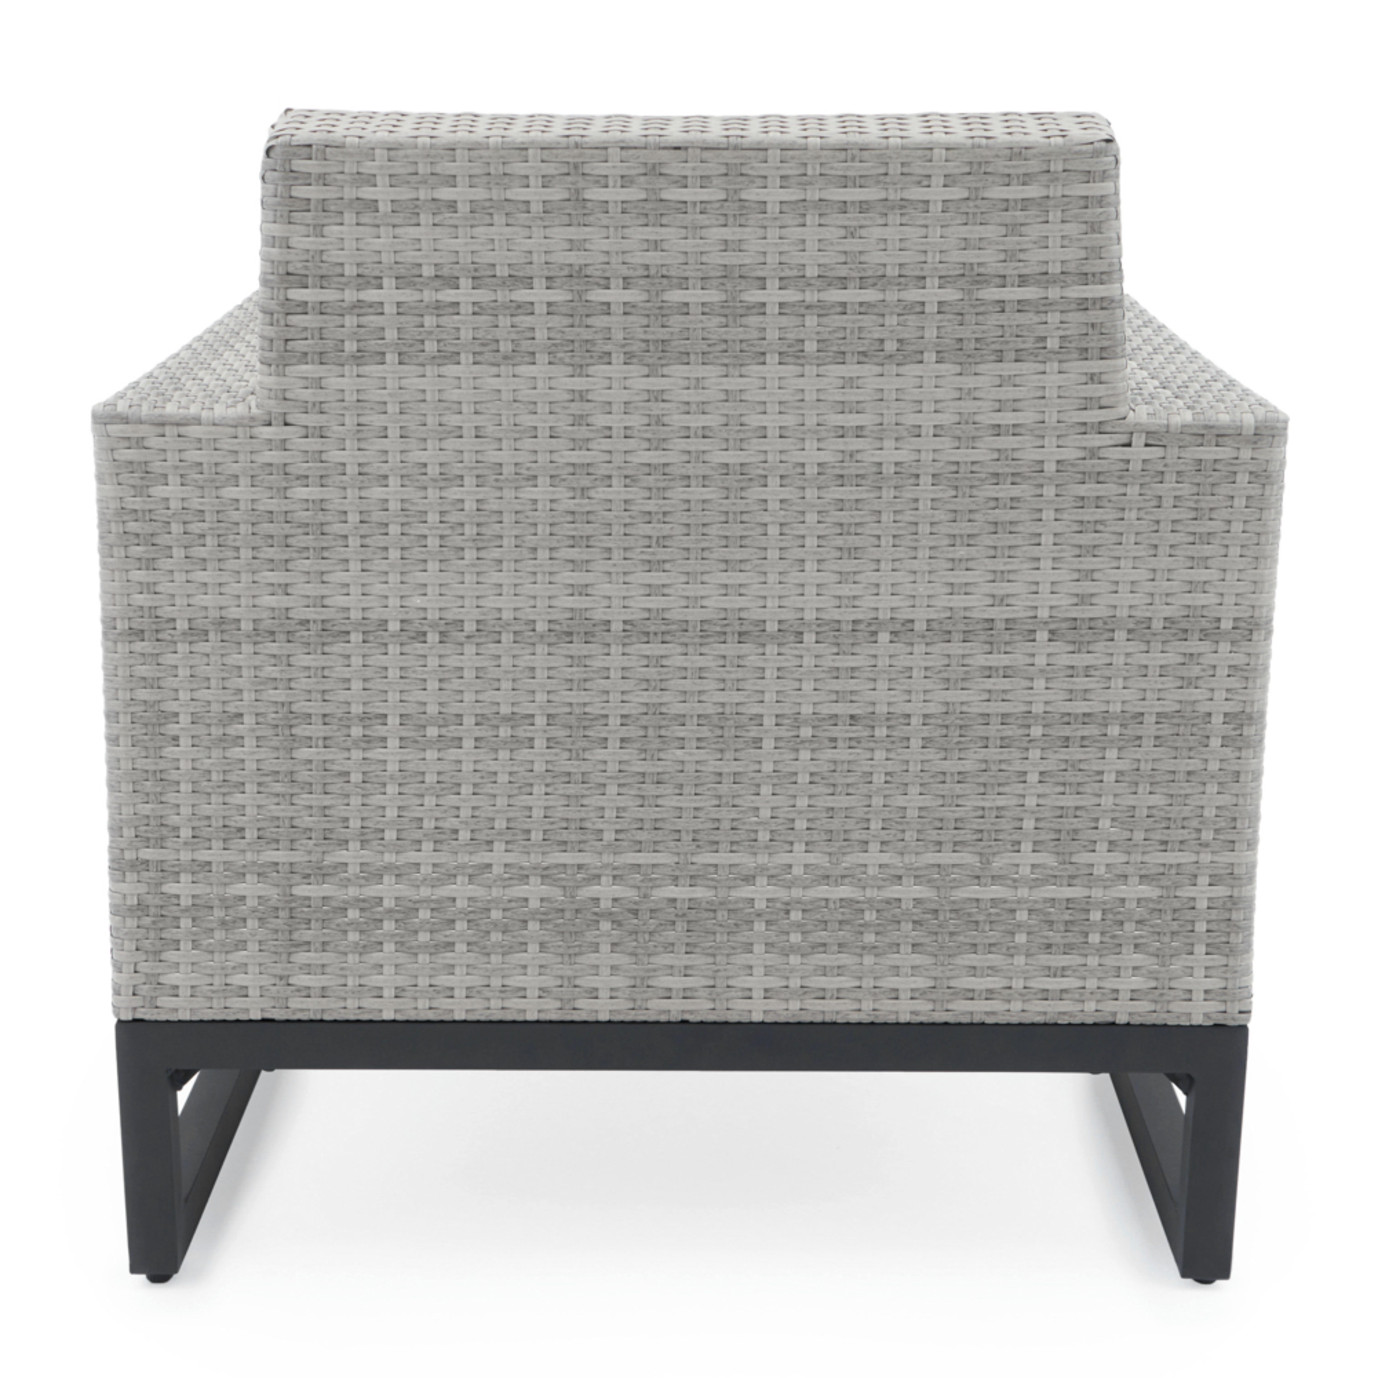 Milo™ Grey Club Chairs - Navy Blue